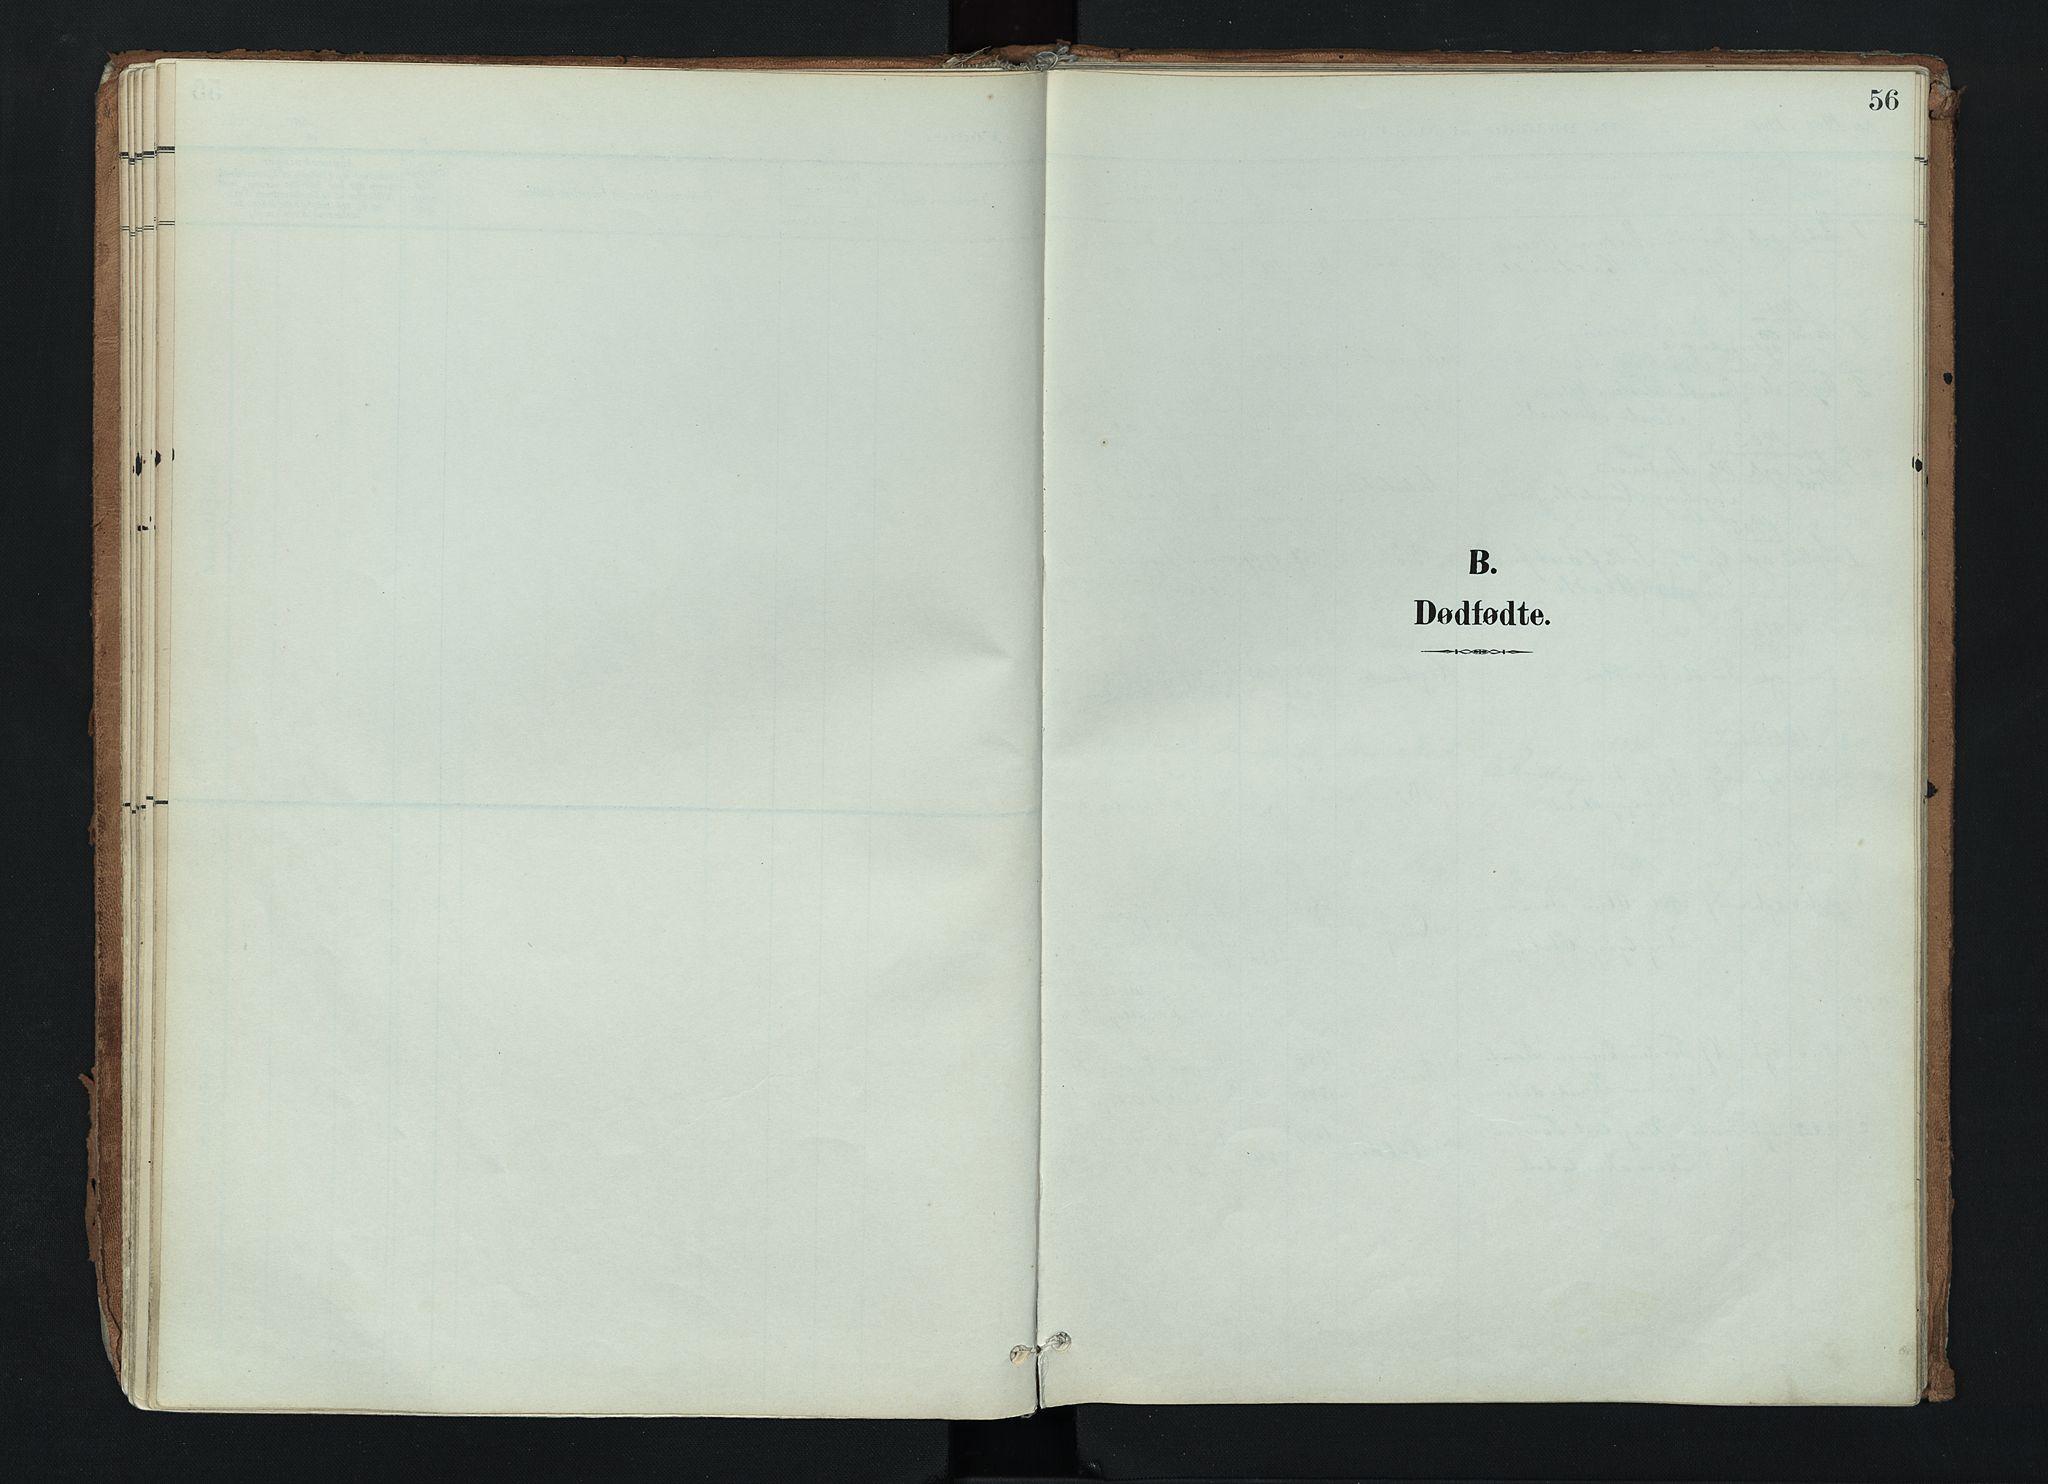 SAH, Nord-Aurdal prestekontor, Ministerialbok nr. 17, 1897-1926, s. 56